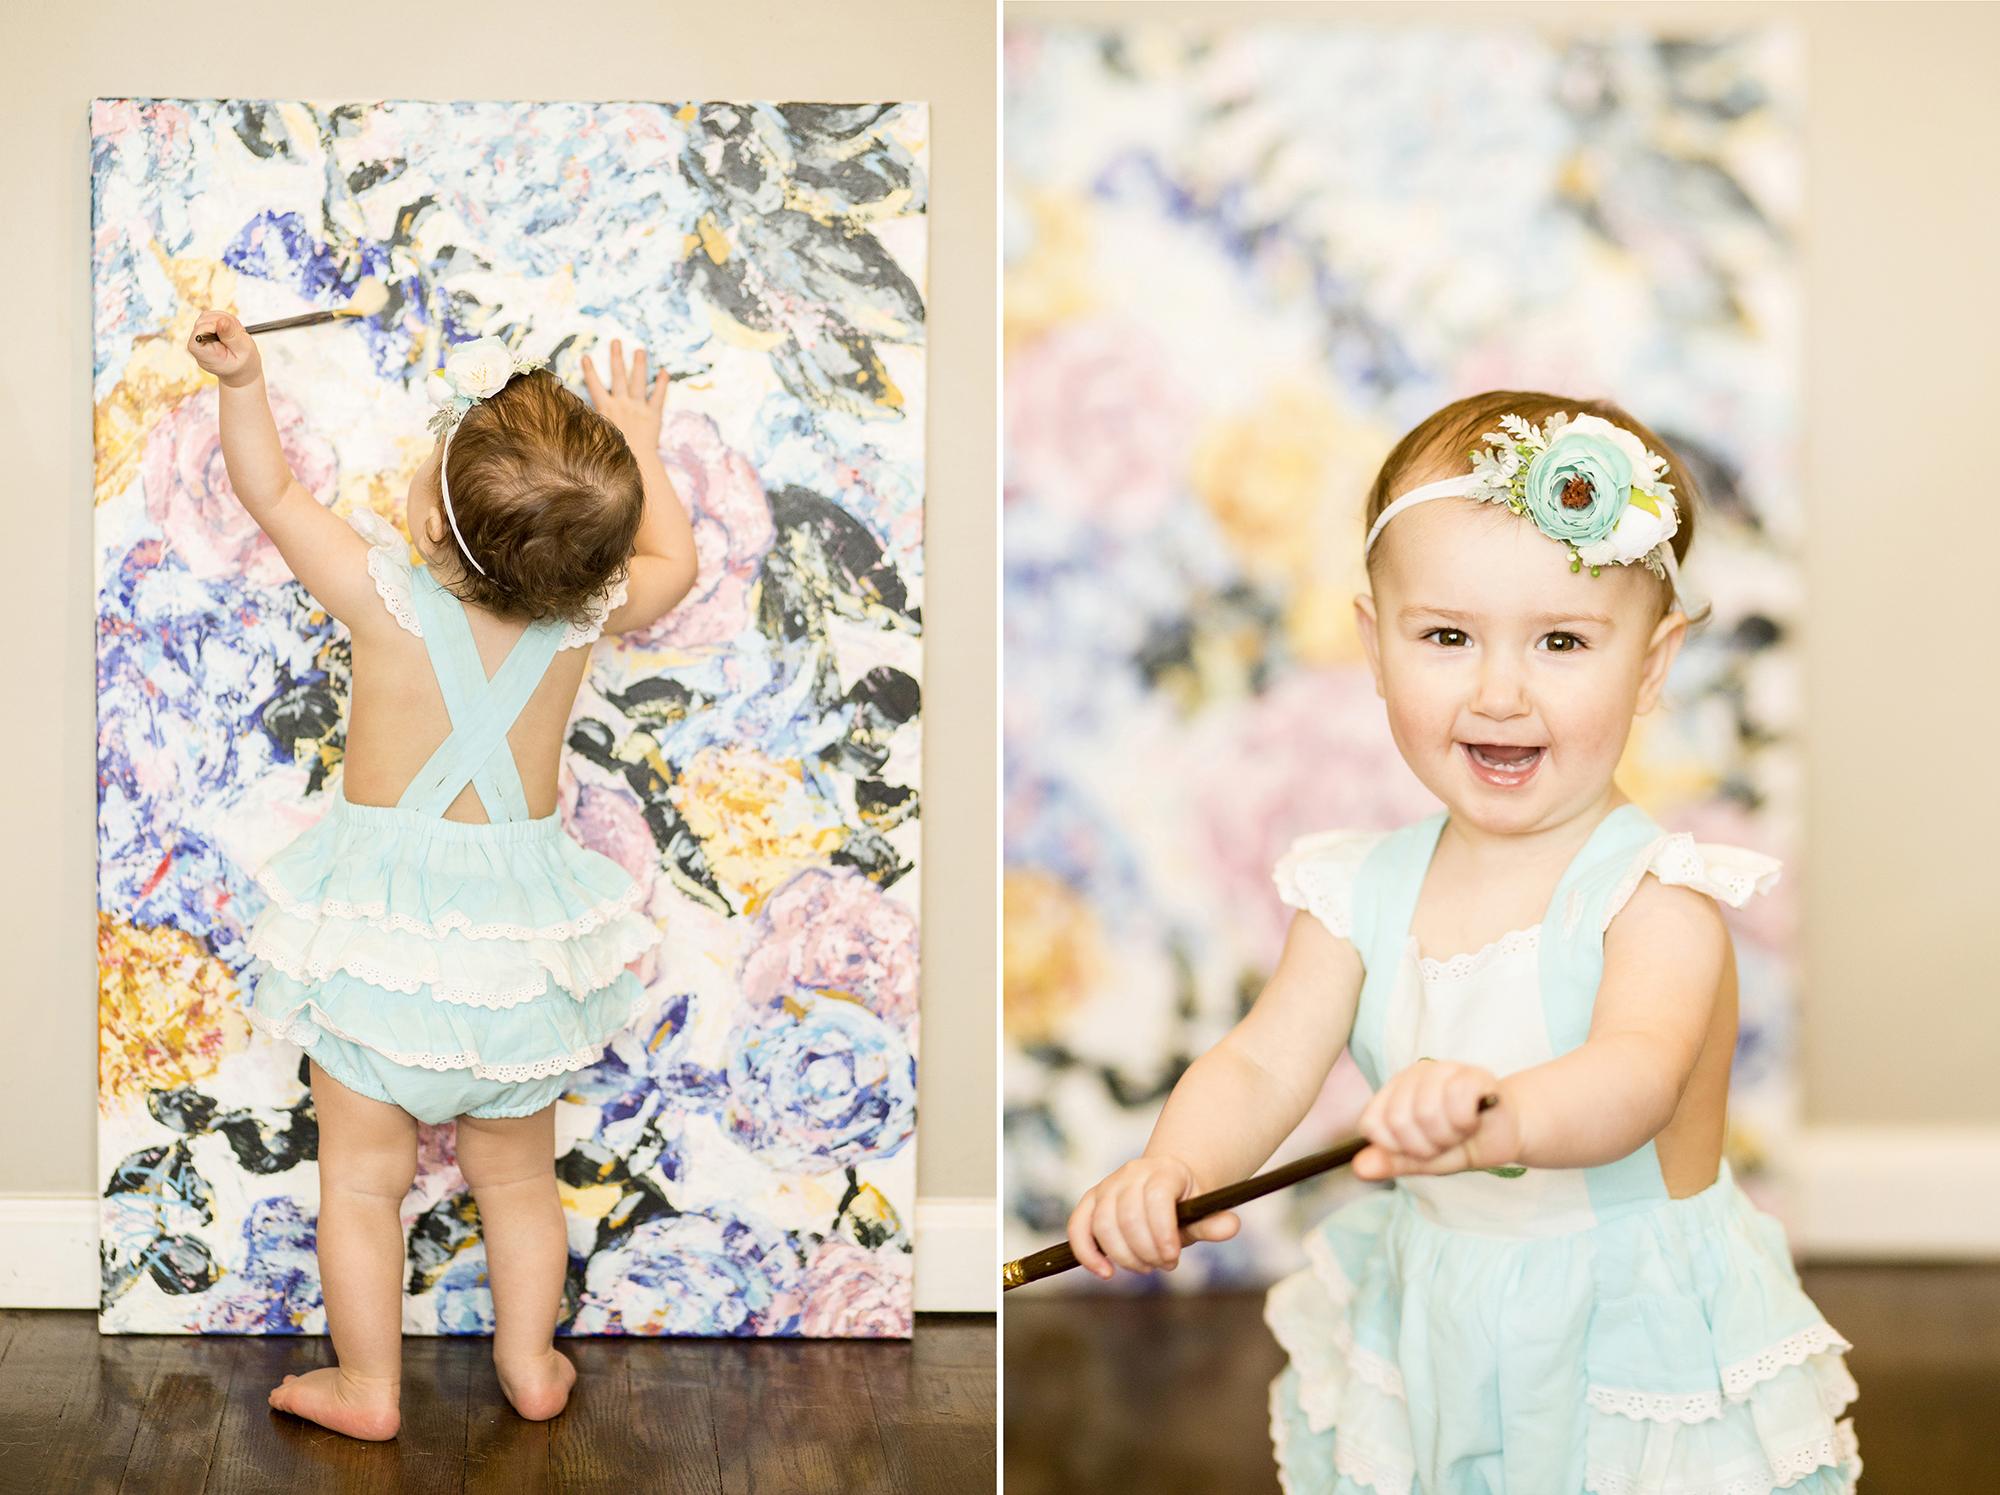 Seriously_Sabrina_Photography_Ashland_Kentucky_family_One_Year_Belle2.jpg